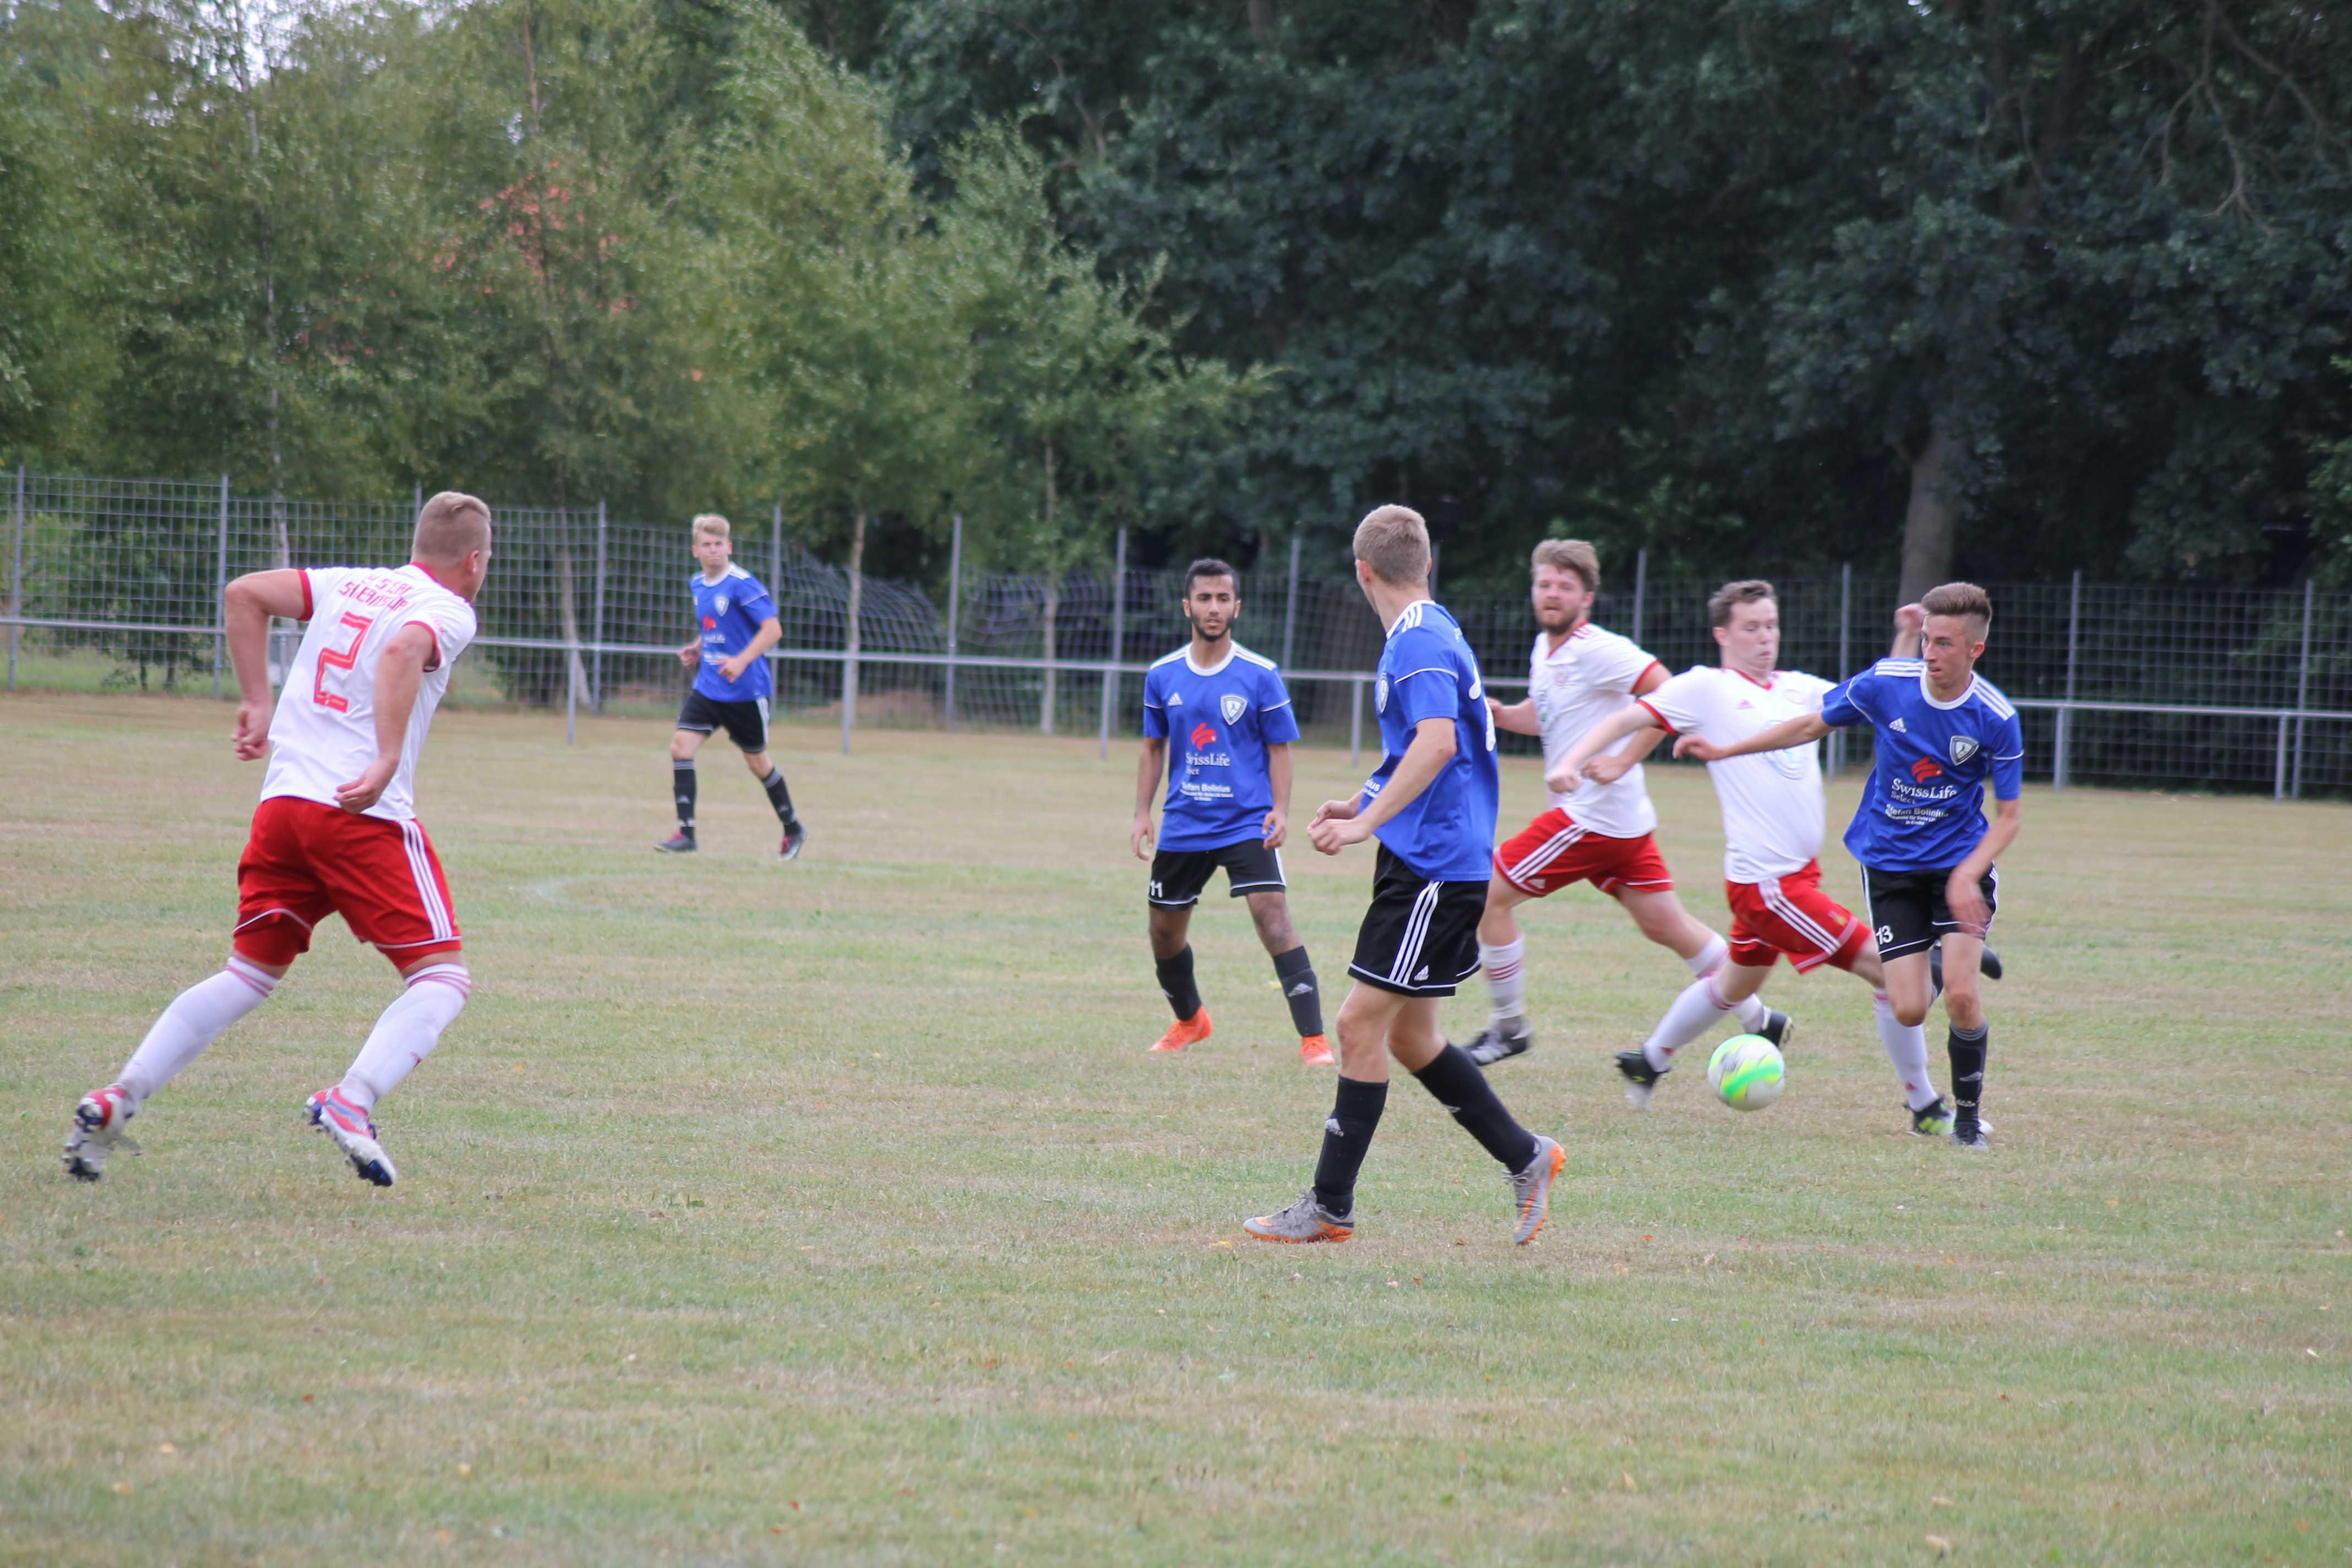 2018-07-29 Sportwoche - Sportpicknick & Football & Fußball (96)